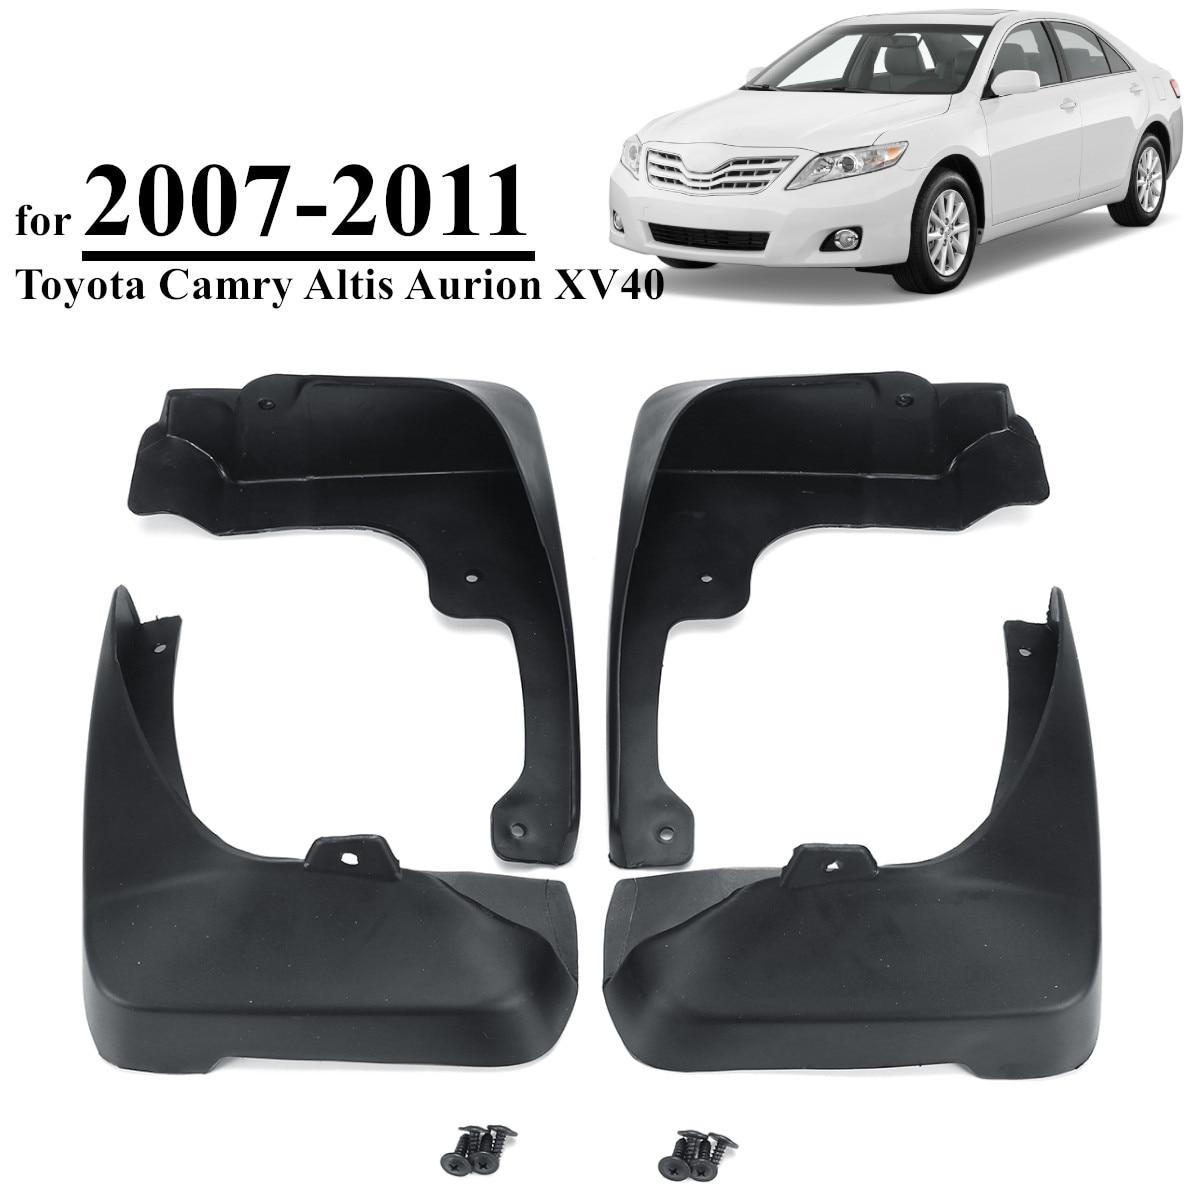 Toyota camry altis aurion xv40 2007-2011 자동차 머드 플랩 펜더 플레어 머드 가드 머드 플랩 스플래쉬 가드